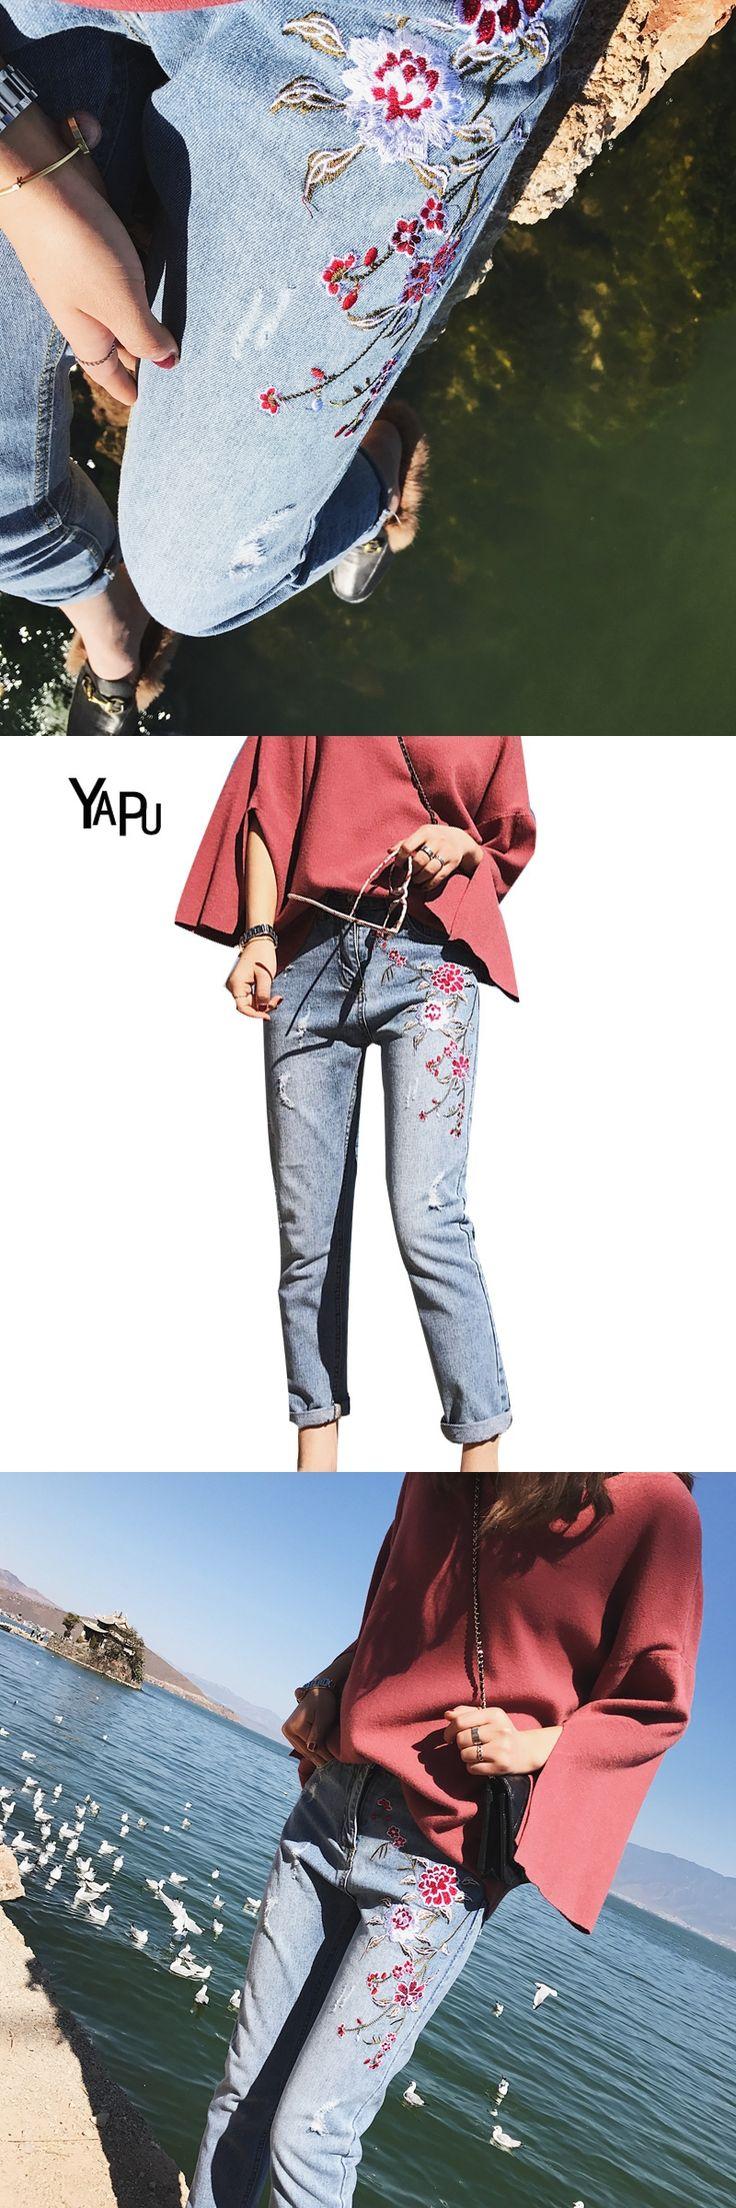 YAPU Floral embroidery jeans female Winter zipper straight denim pants jeans women Fashion pocket light blue trousers jeans